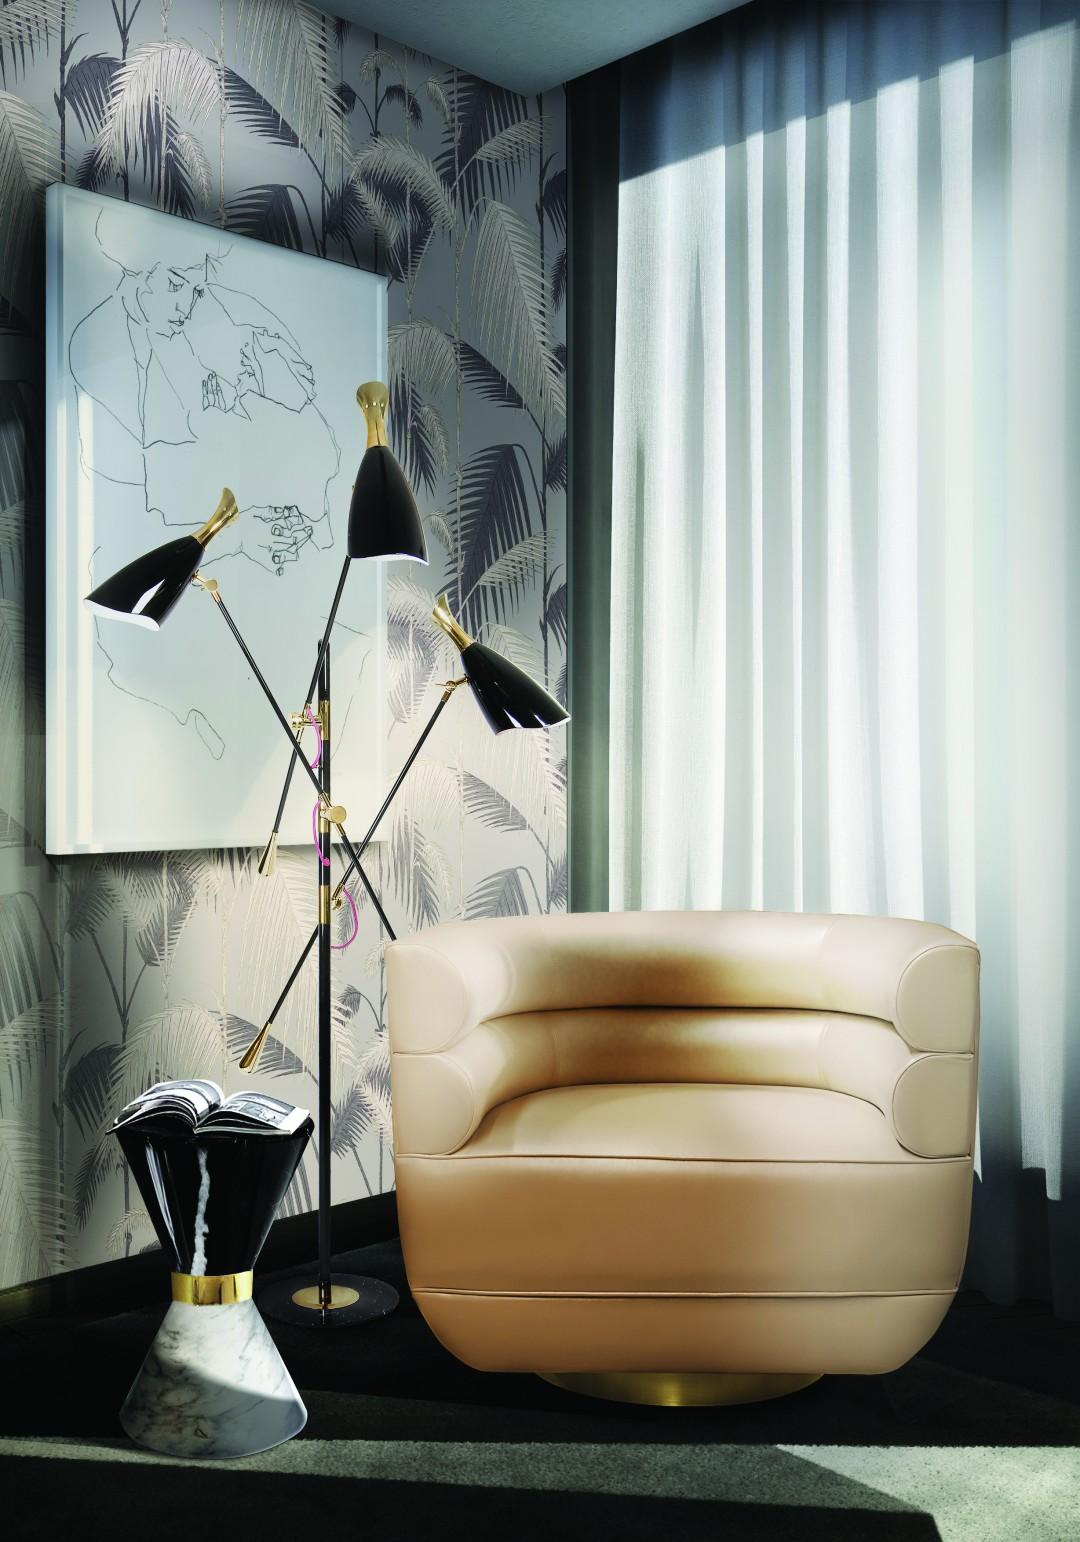 triple lampshade Best Mid-Century TripleLamp Shade Floor Lamps! duke floor ambience 07 HR2f2e7b417feb4802e91cb6b870baa643